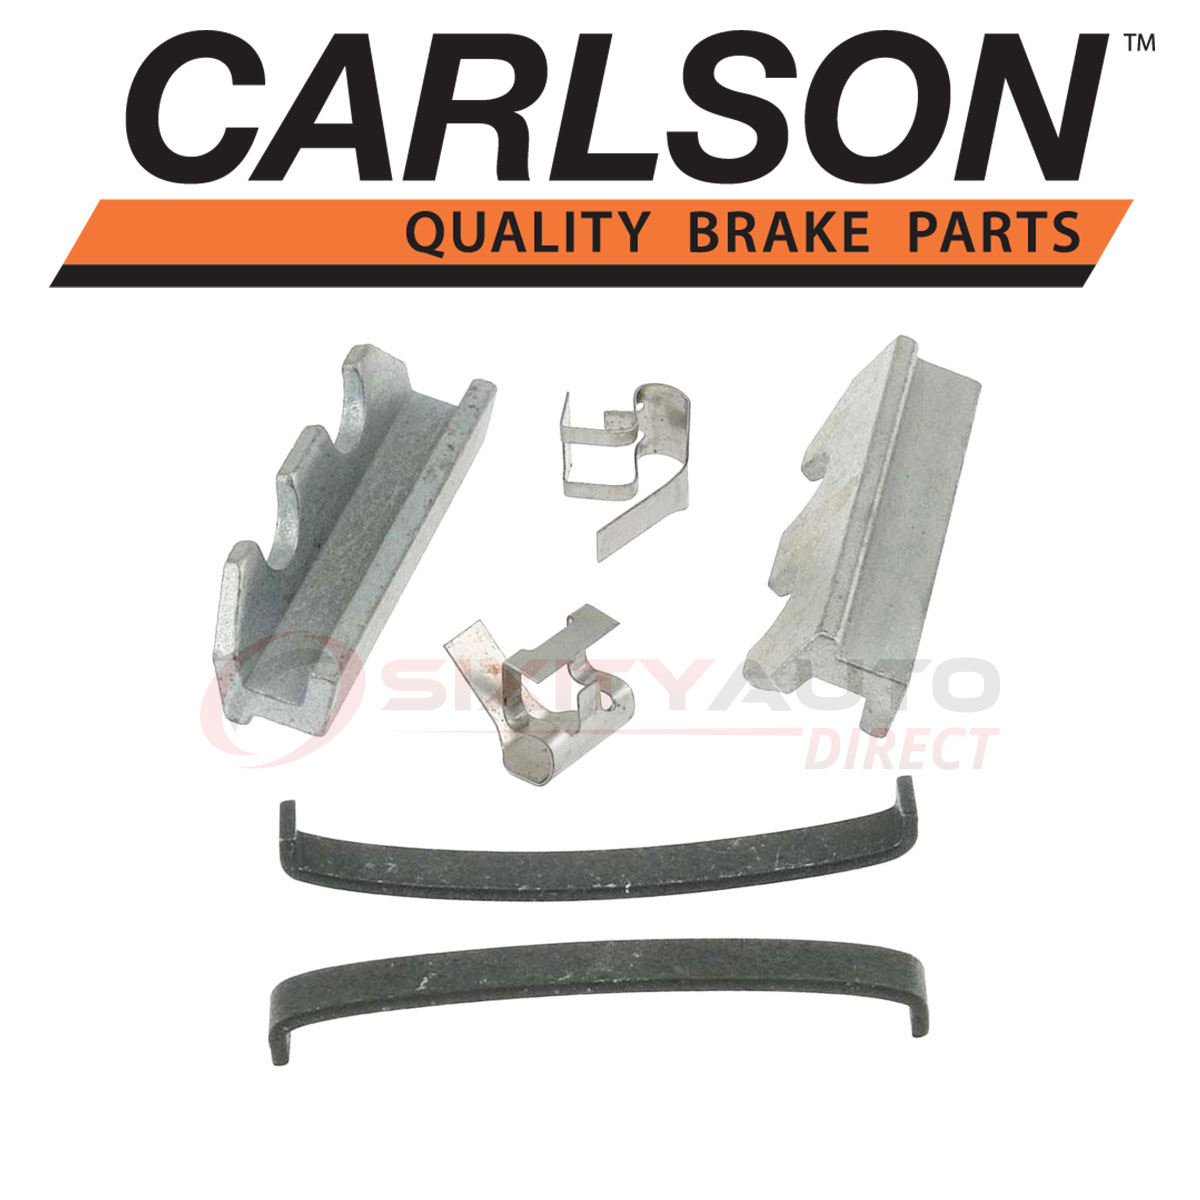 Carlson Front Disc Brake Pad Wear Sensor for 2016-2017 BMW X1 Service ch